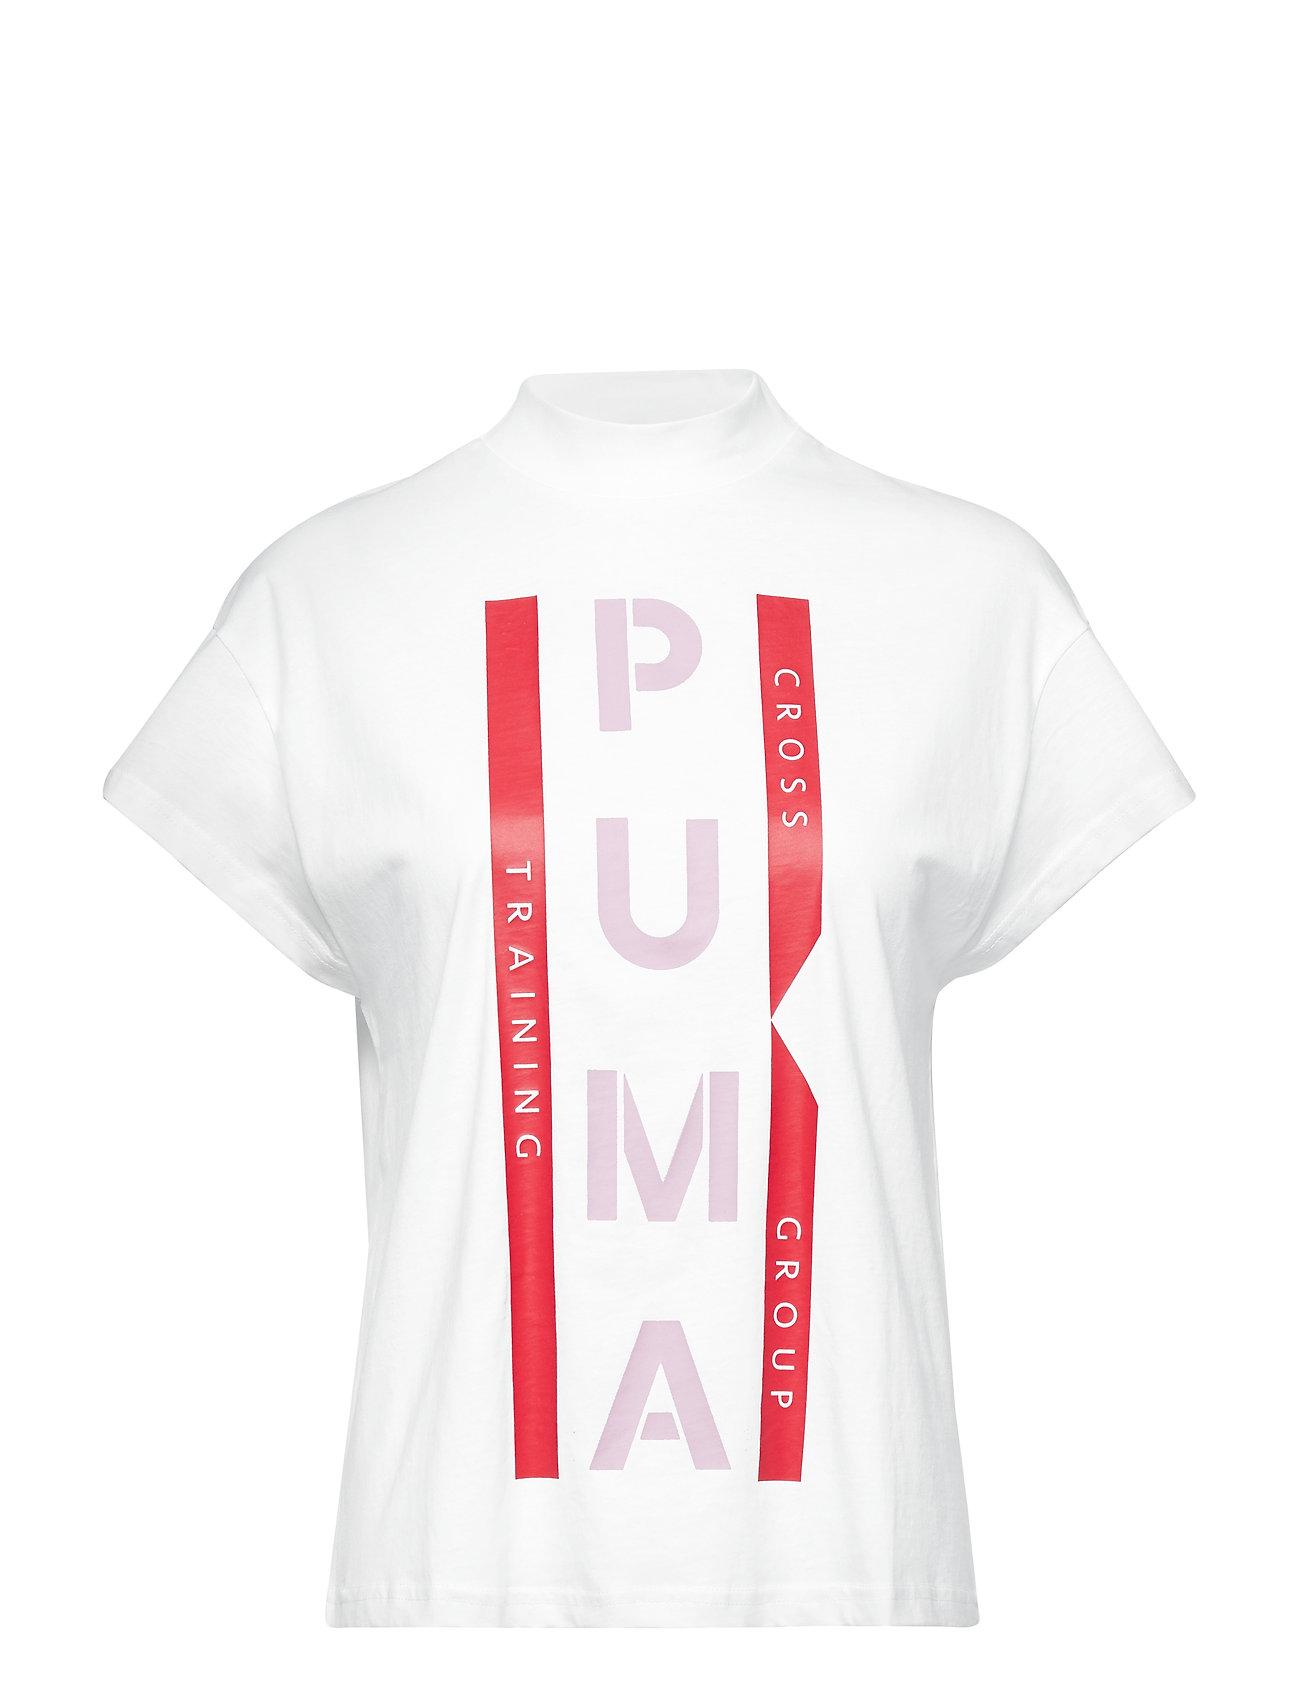 03c60359 Puma Xtg Graphic Tee (Puma White) (17.50 €) - PUMA - | Boozt.com